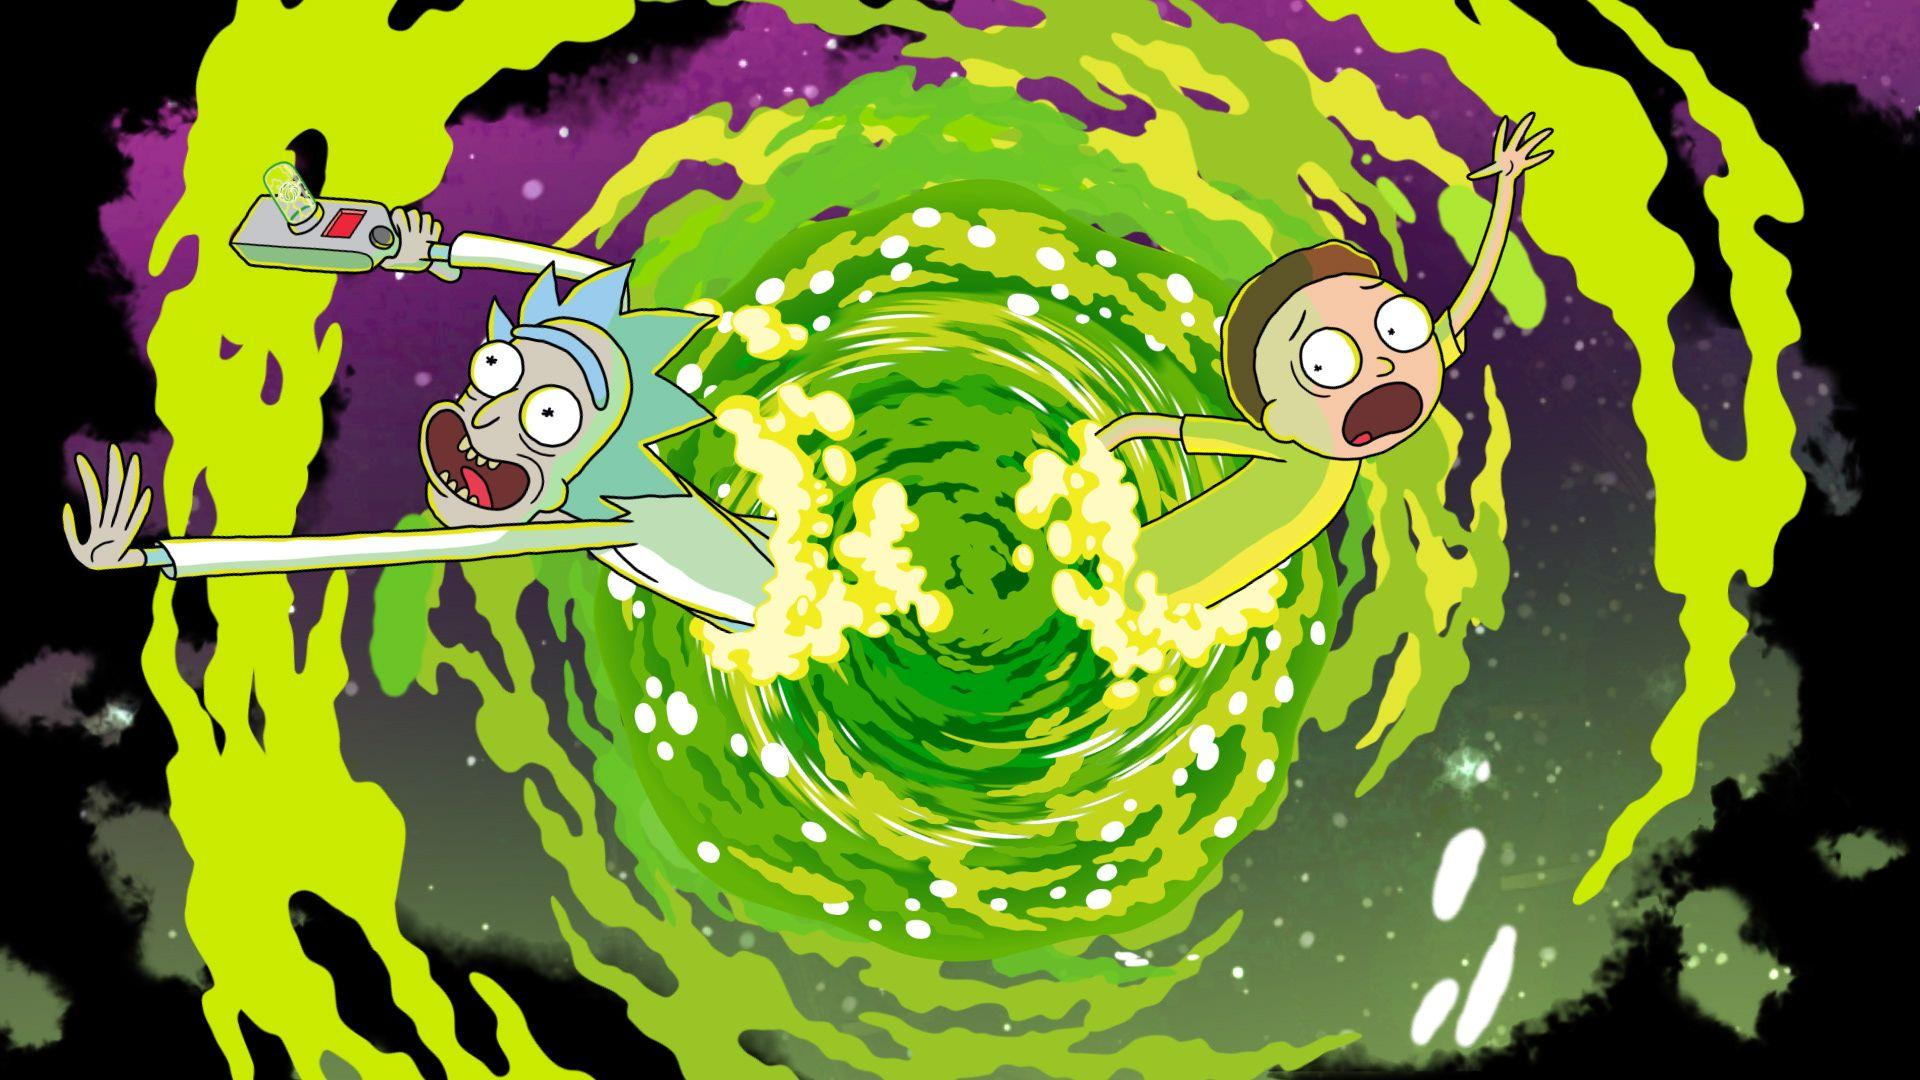 HD Rick And Morty Desktop Wallpapers - Wallpaper Cave